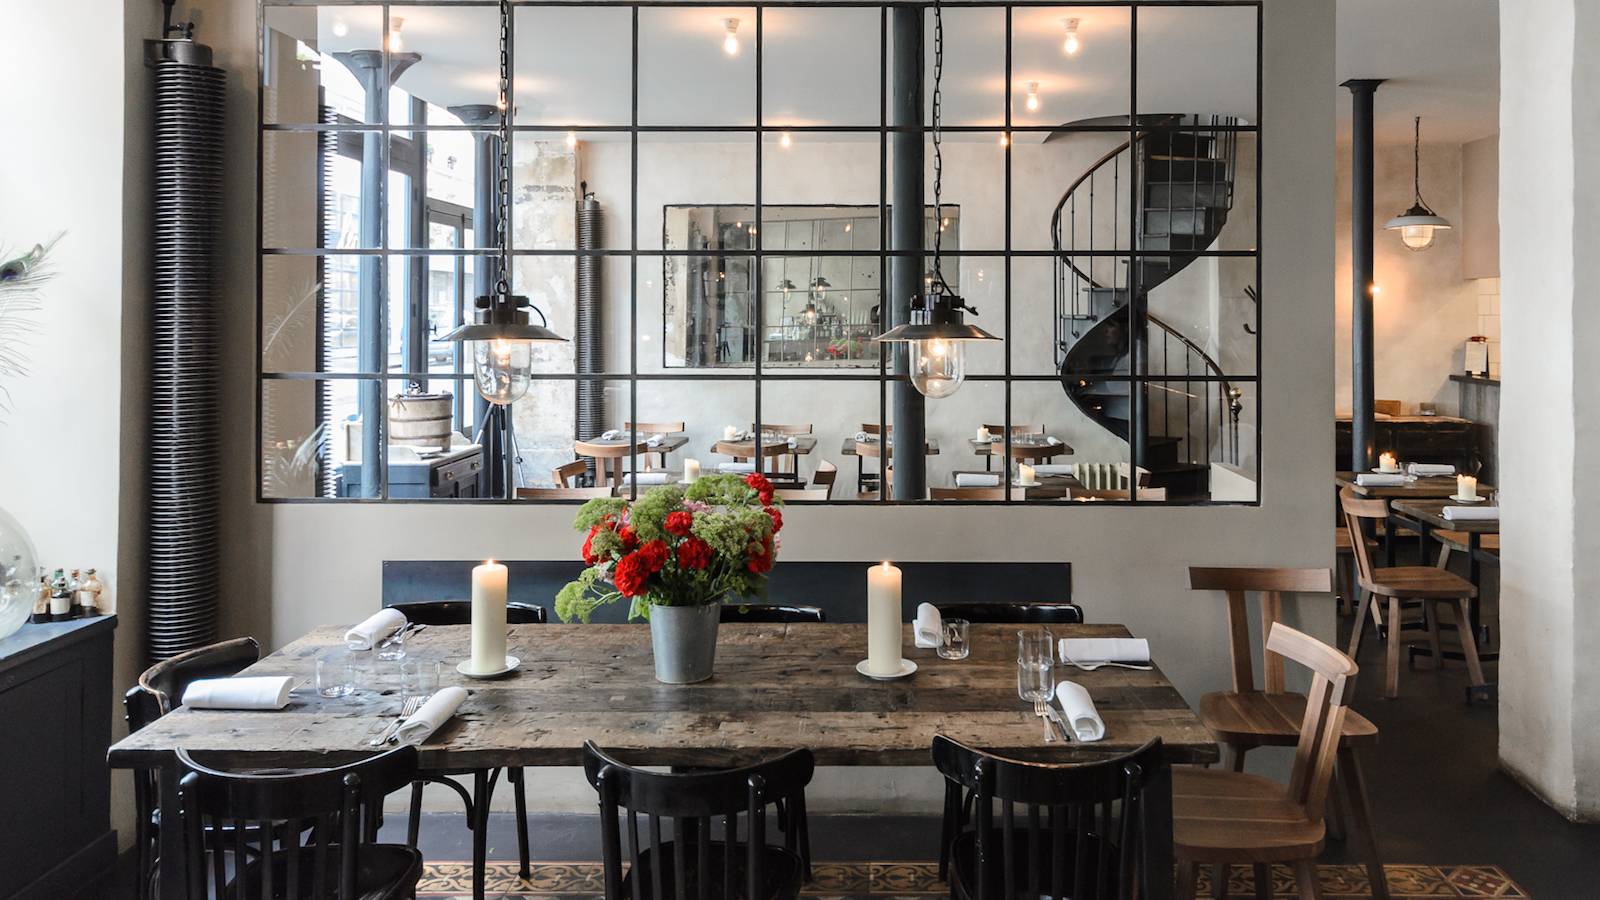 Septime Restaurant (image via  Suitcase Mag )